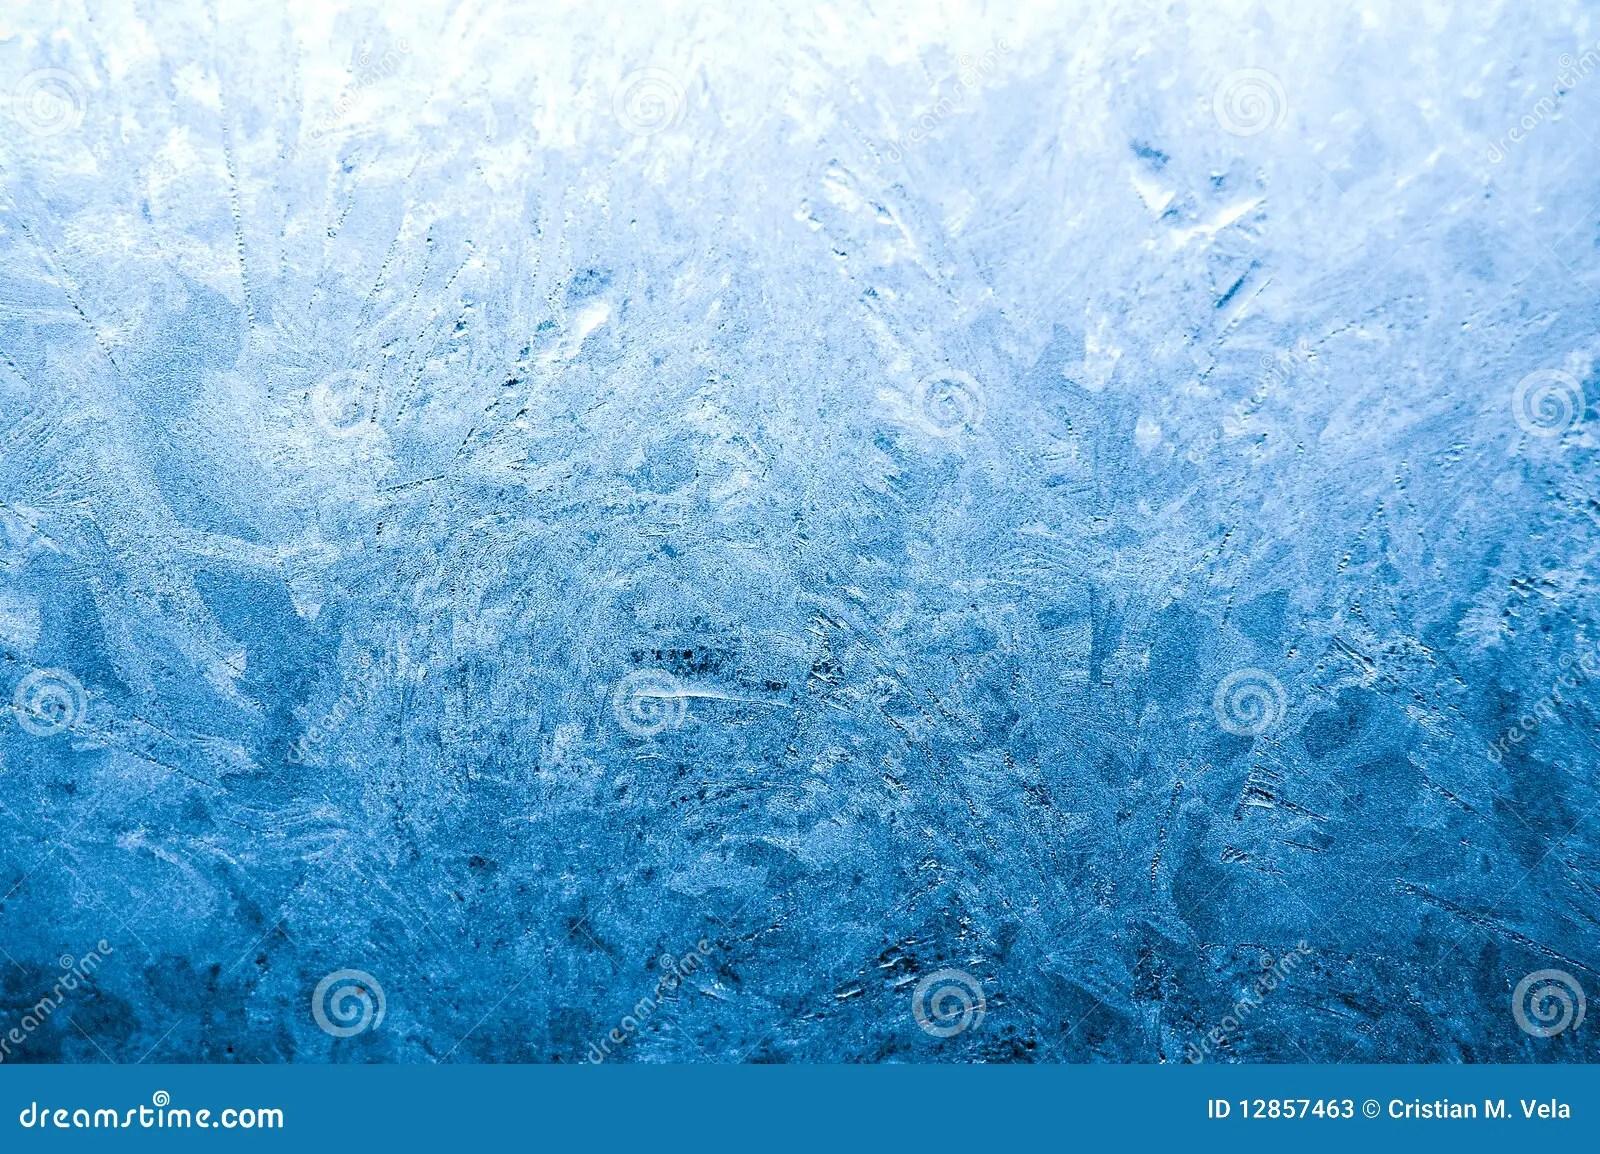 Wallpaper Frozen Hd Frozen Background Stock Photos Image 12857463